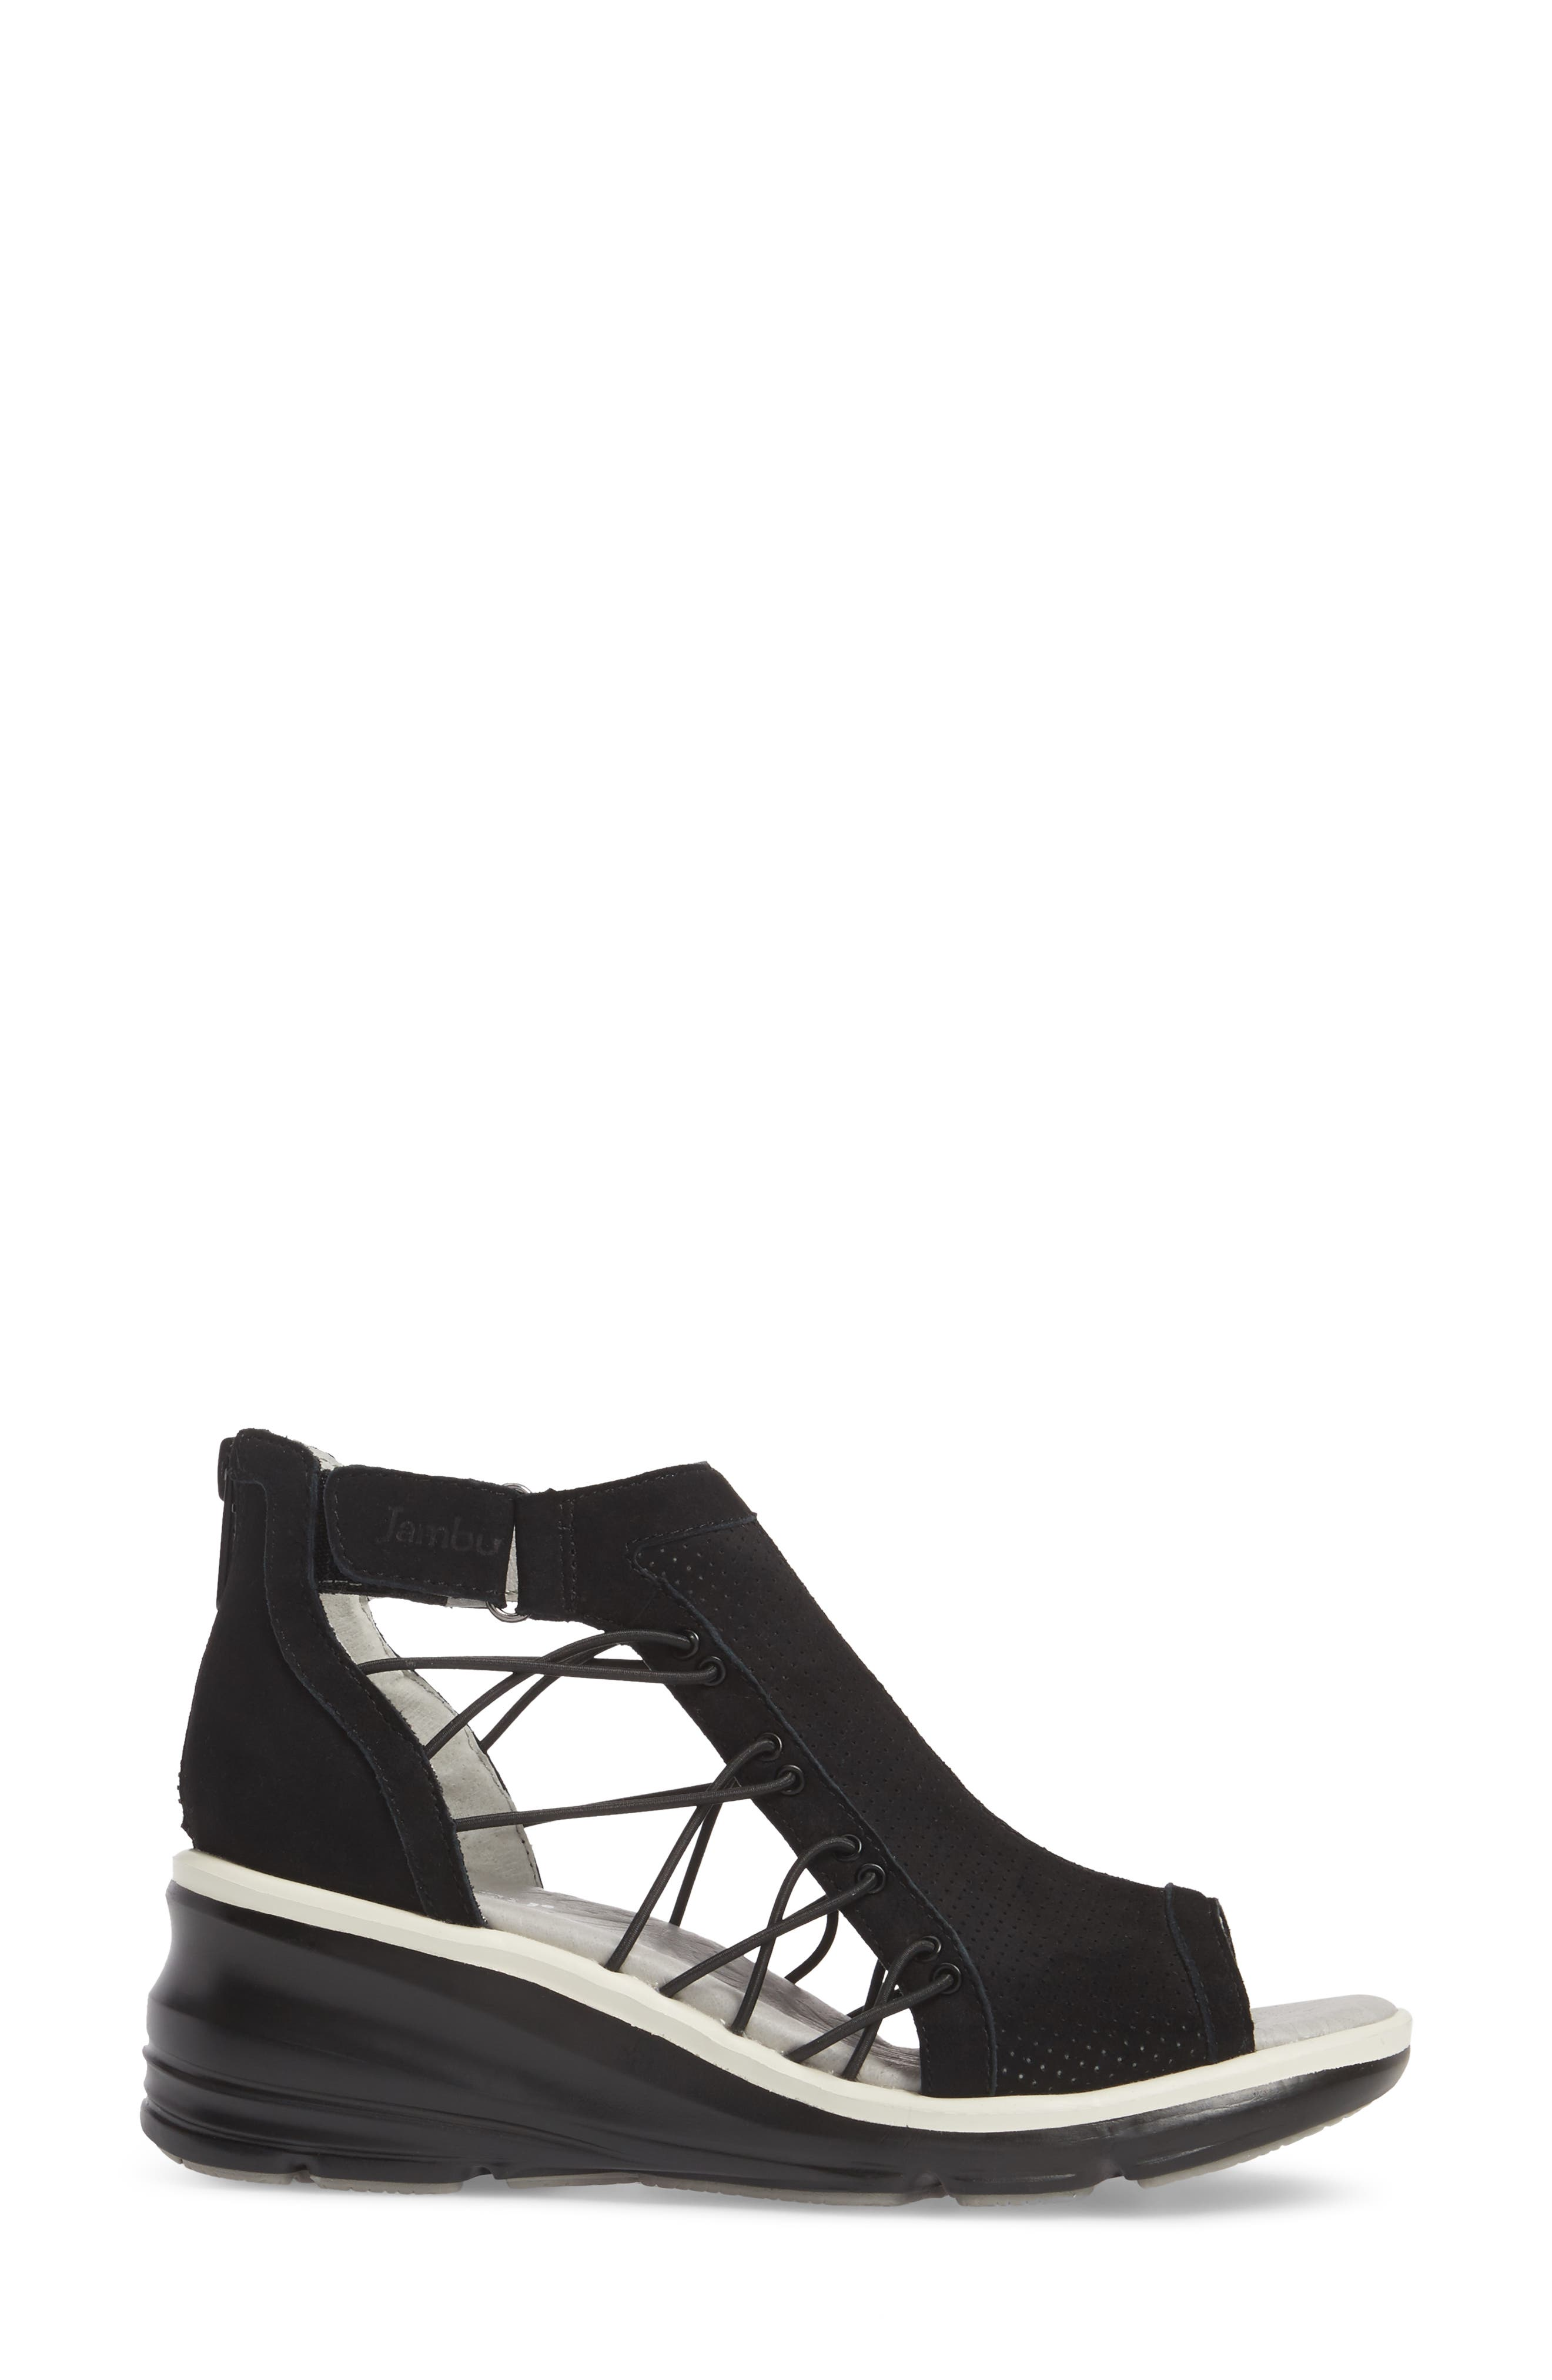 Alternate Image 3  - Jambu Naomi Perforated Wedge Sandal (Women)